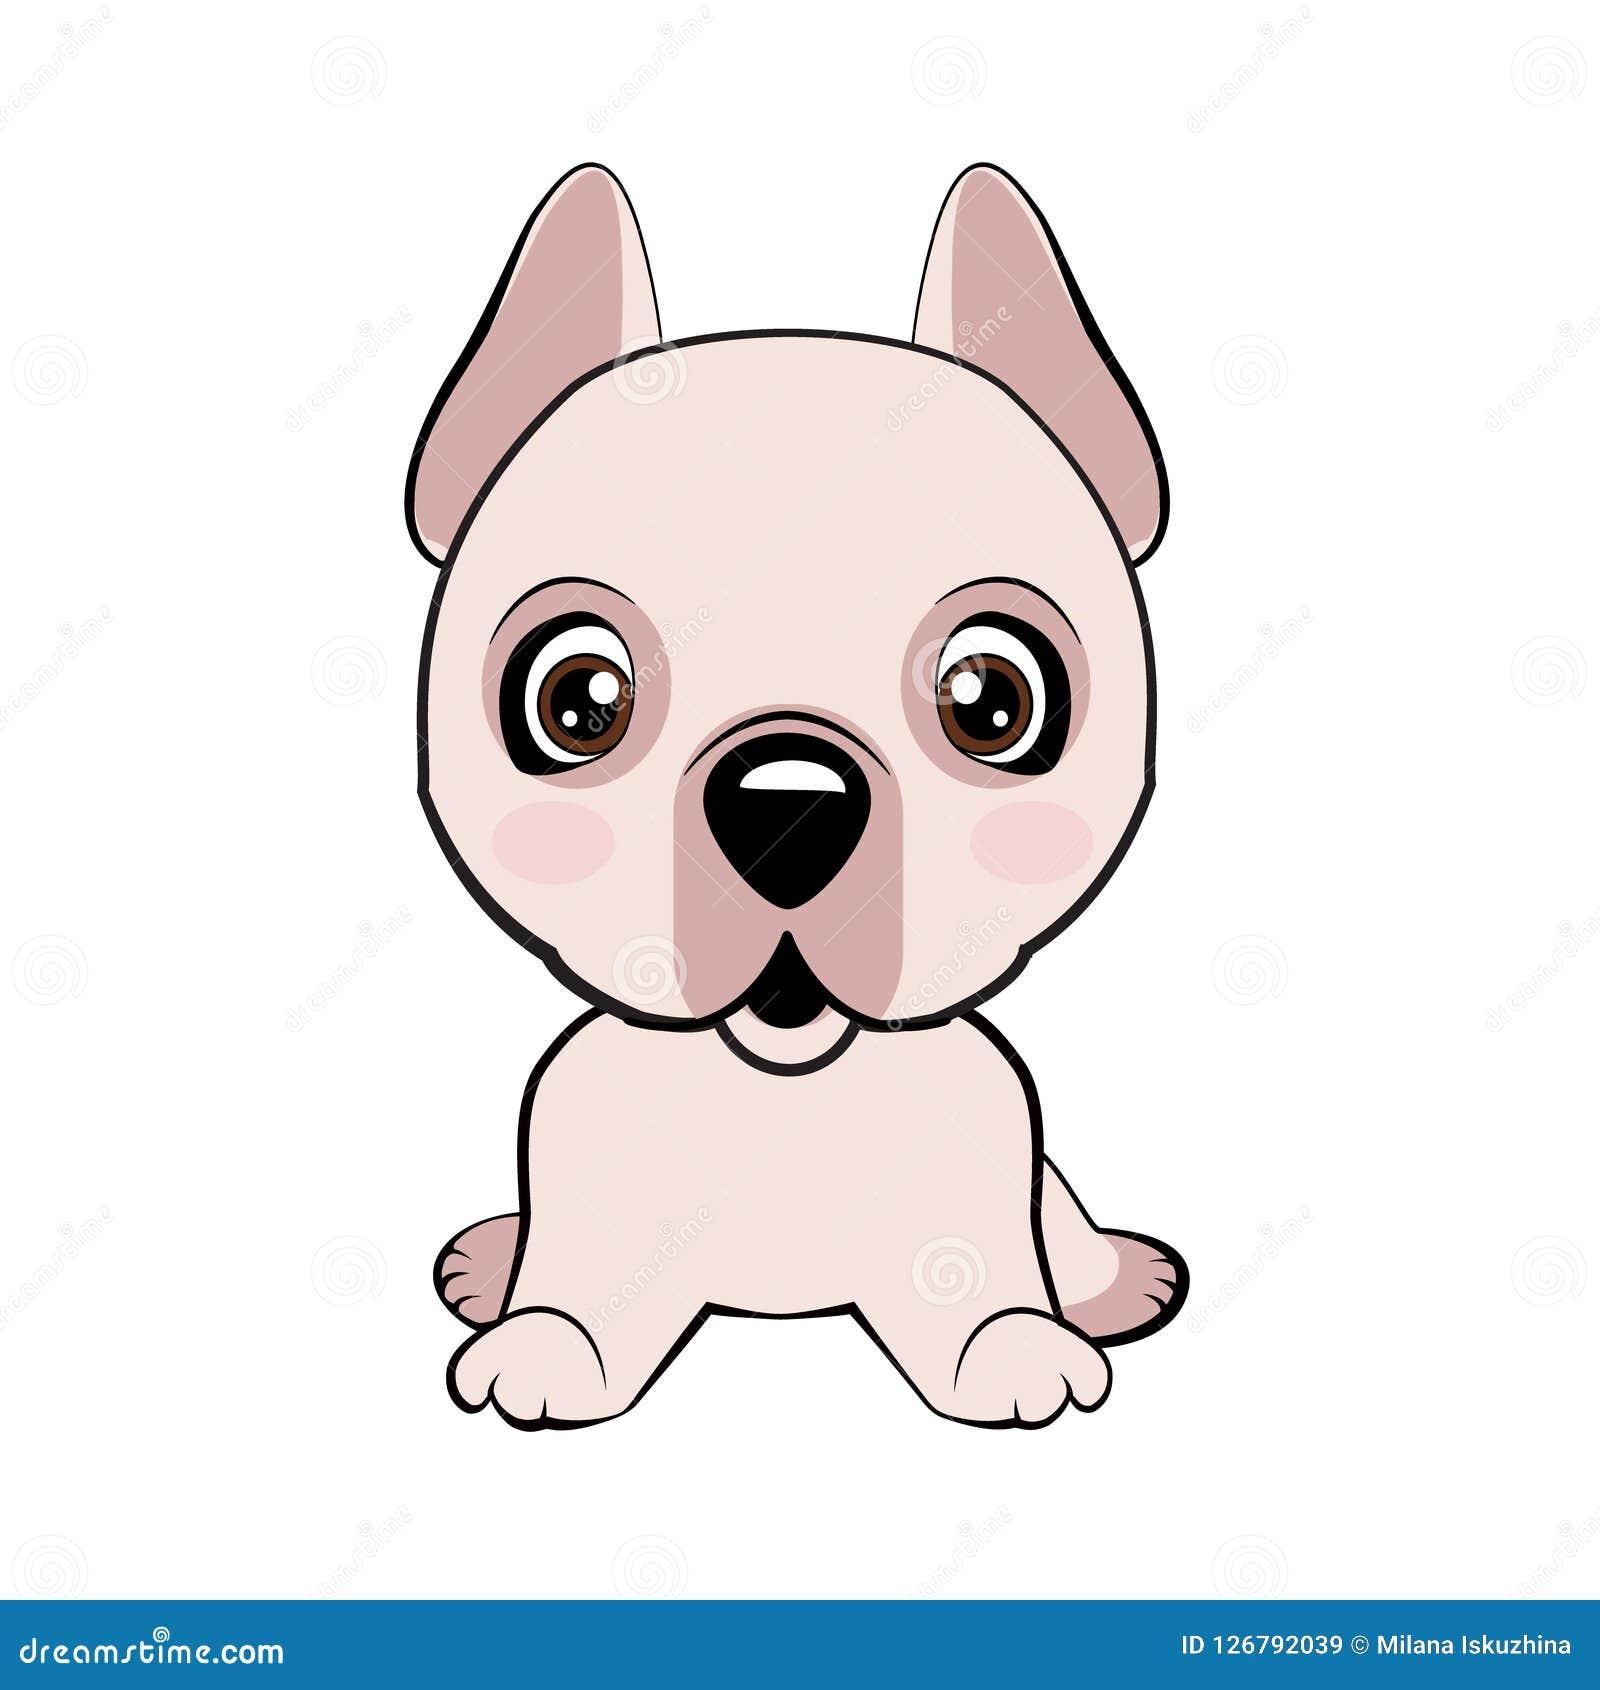 Emoji Character Cartoon Dog Embarrassed, Shy And Blushes